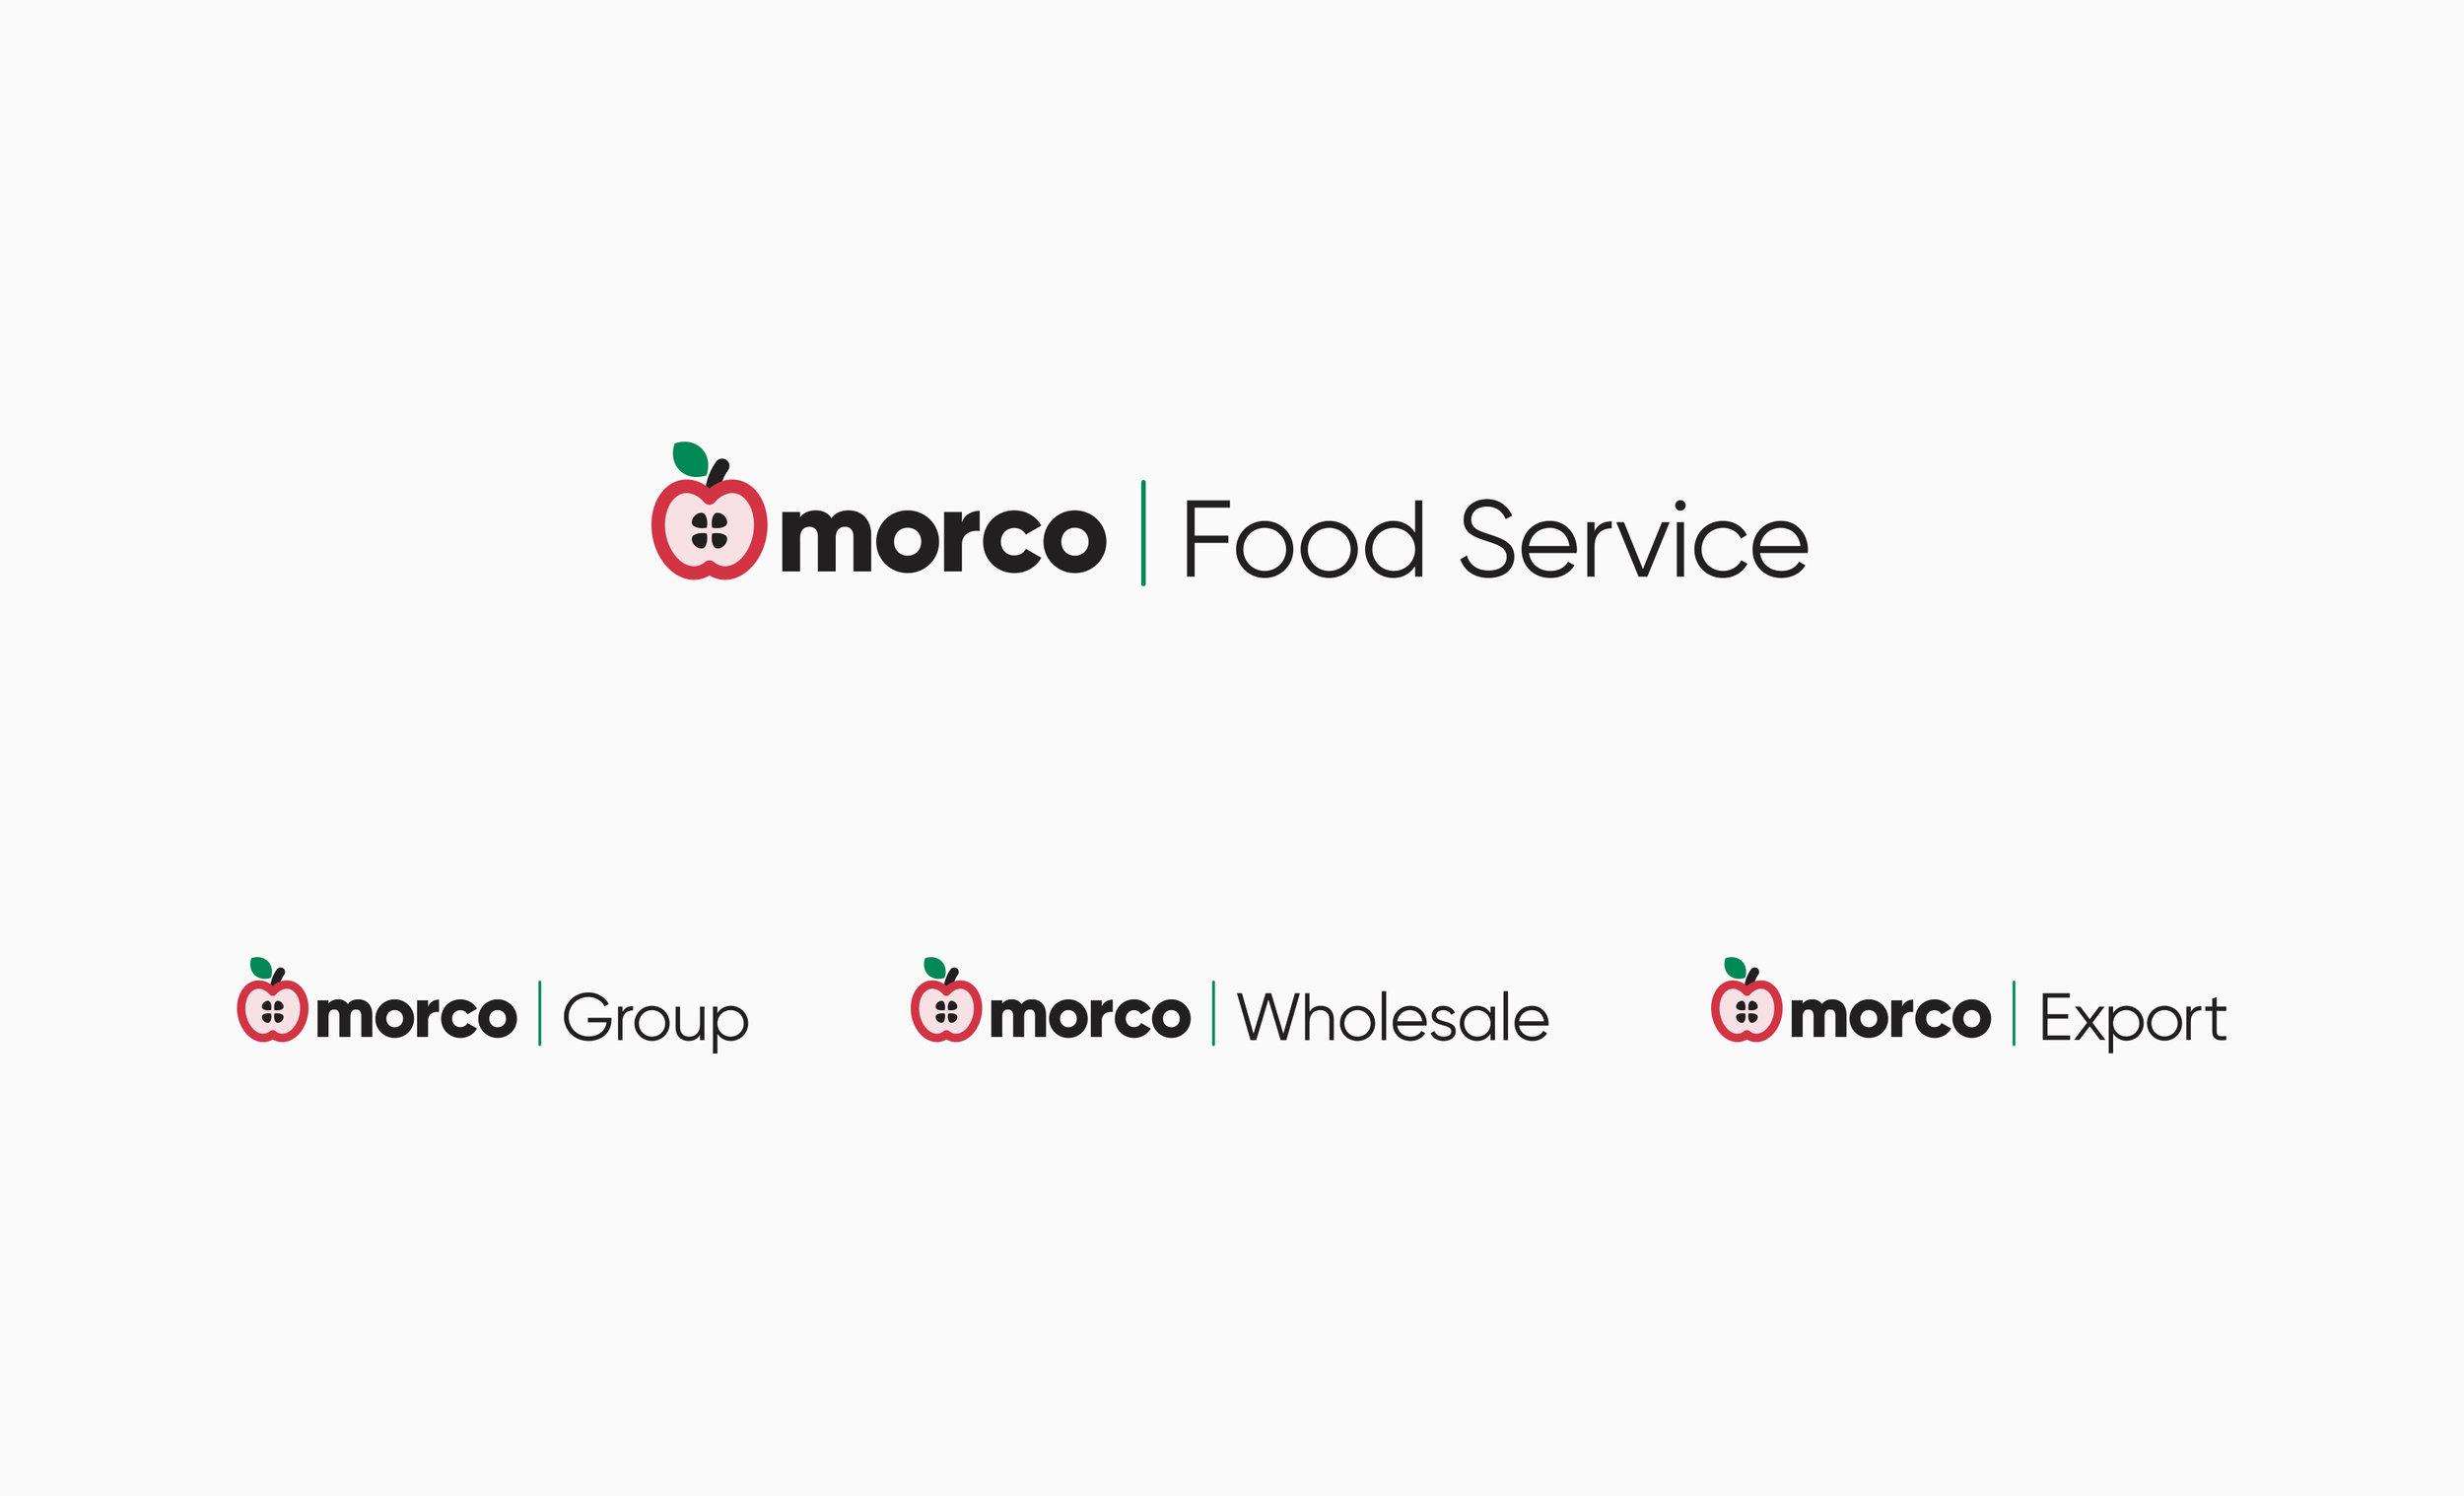 Sub-branding system